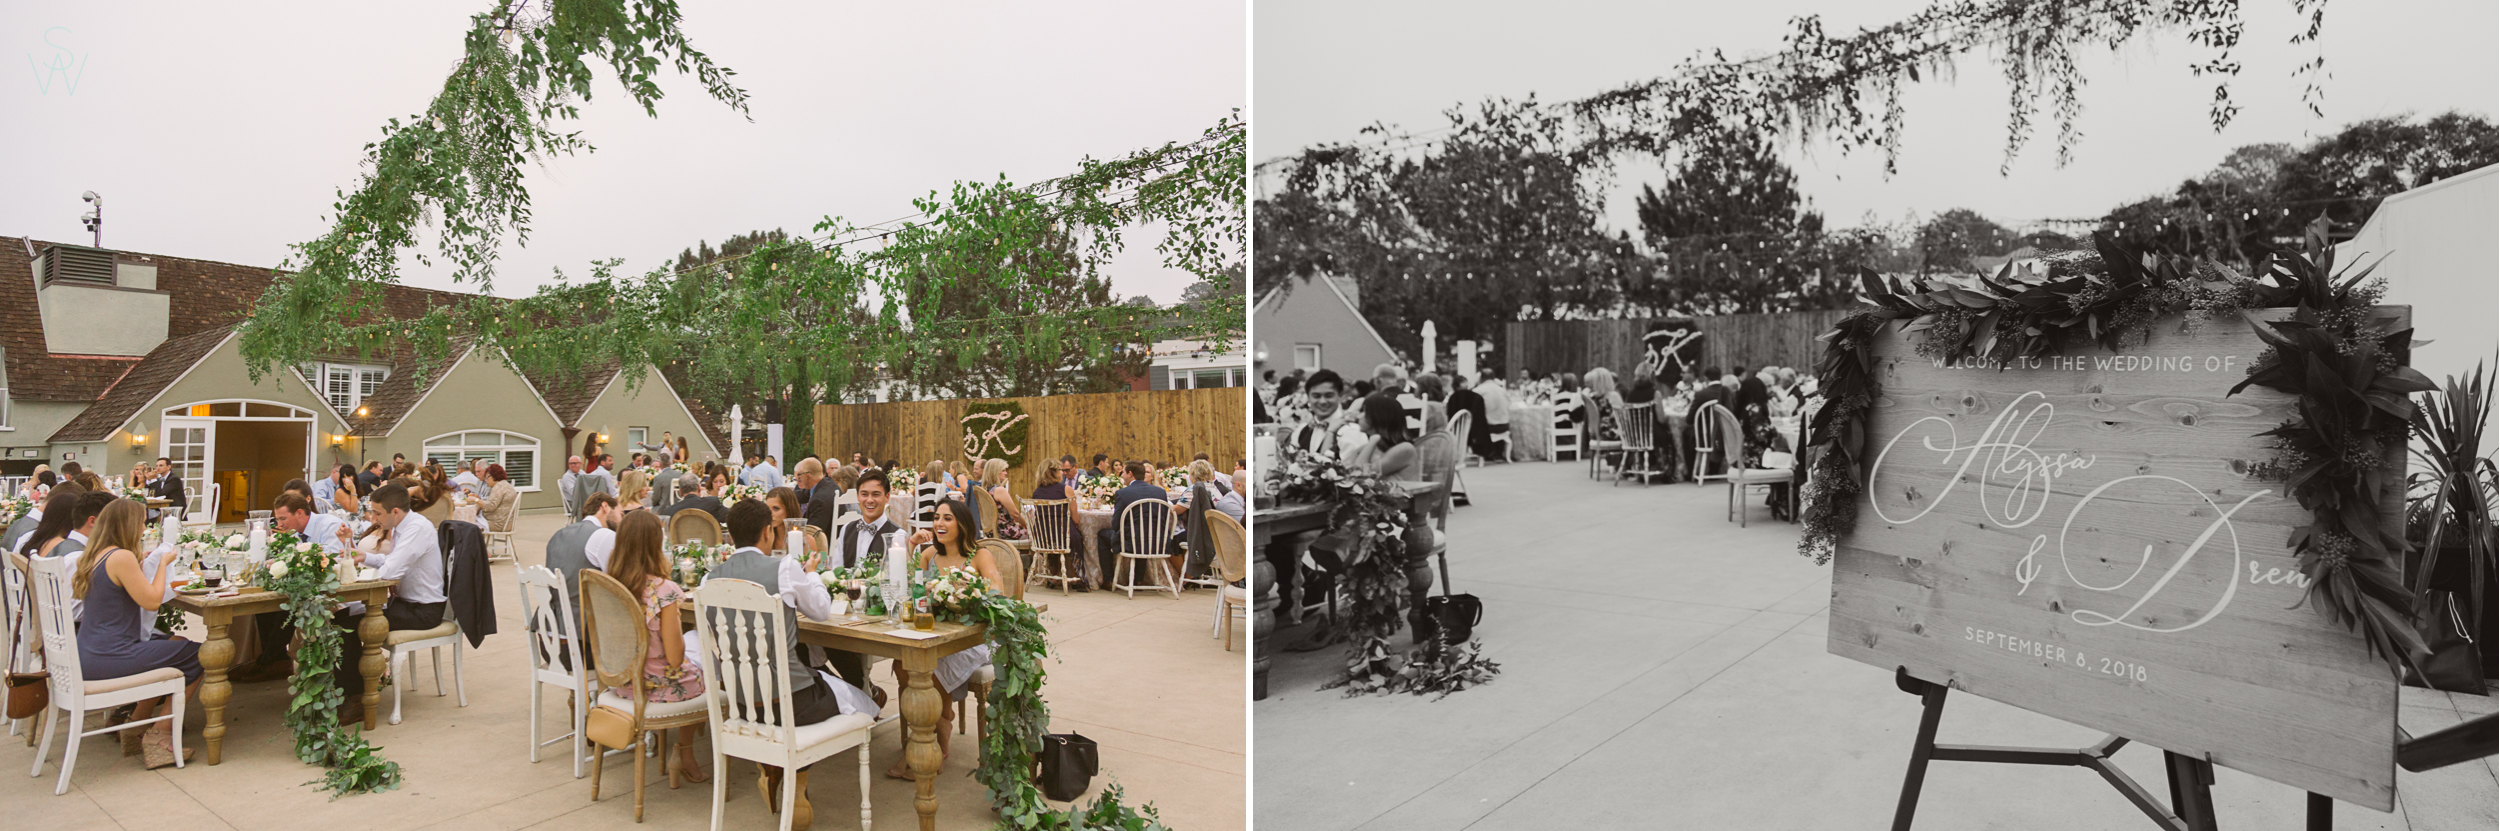 218Lauberge.shewanders.wedding.photography.JPG